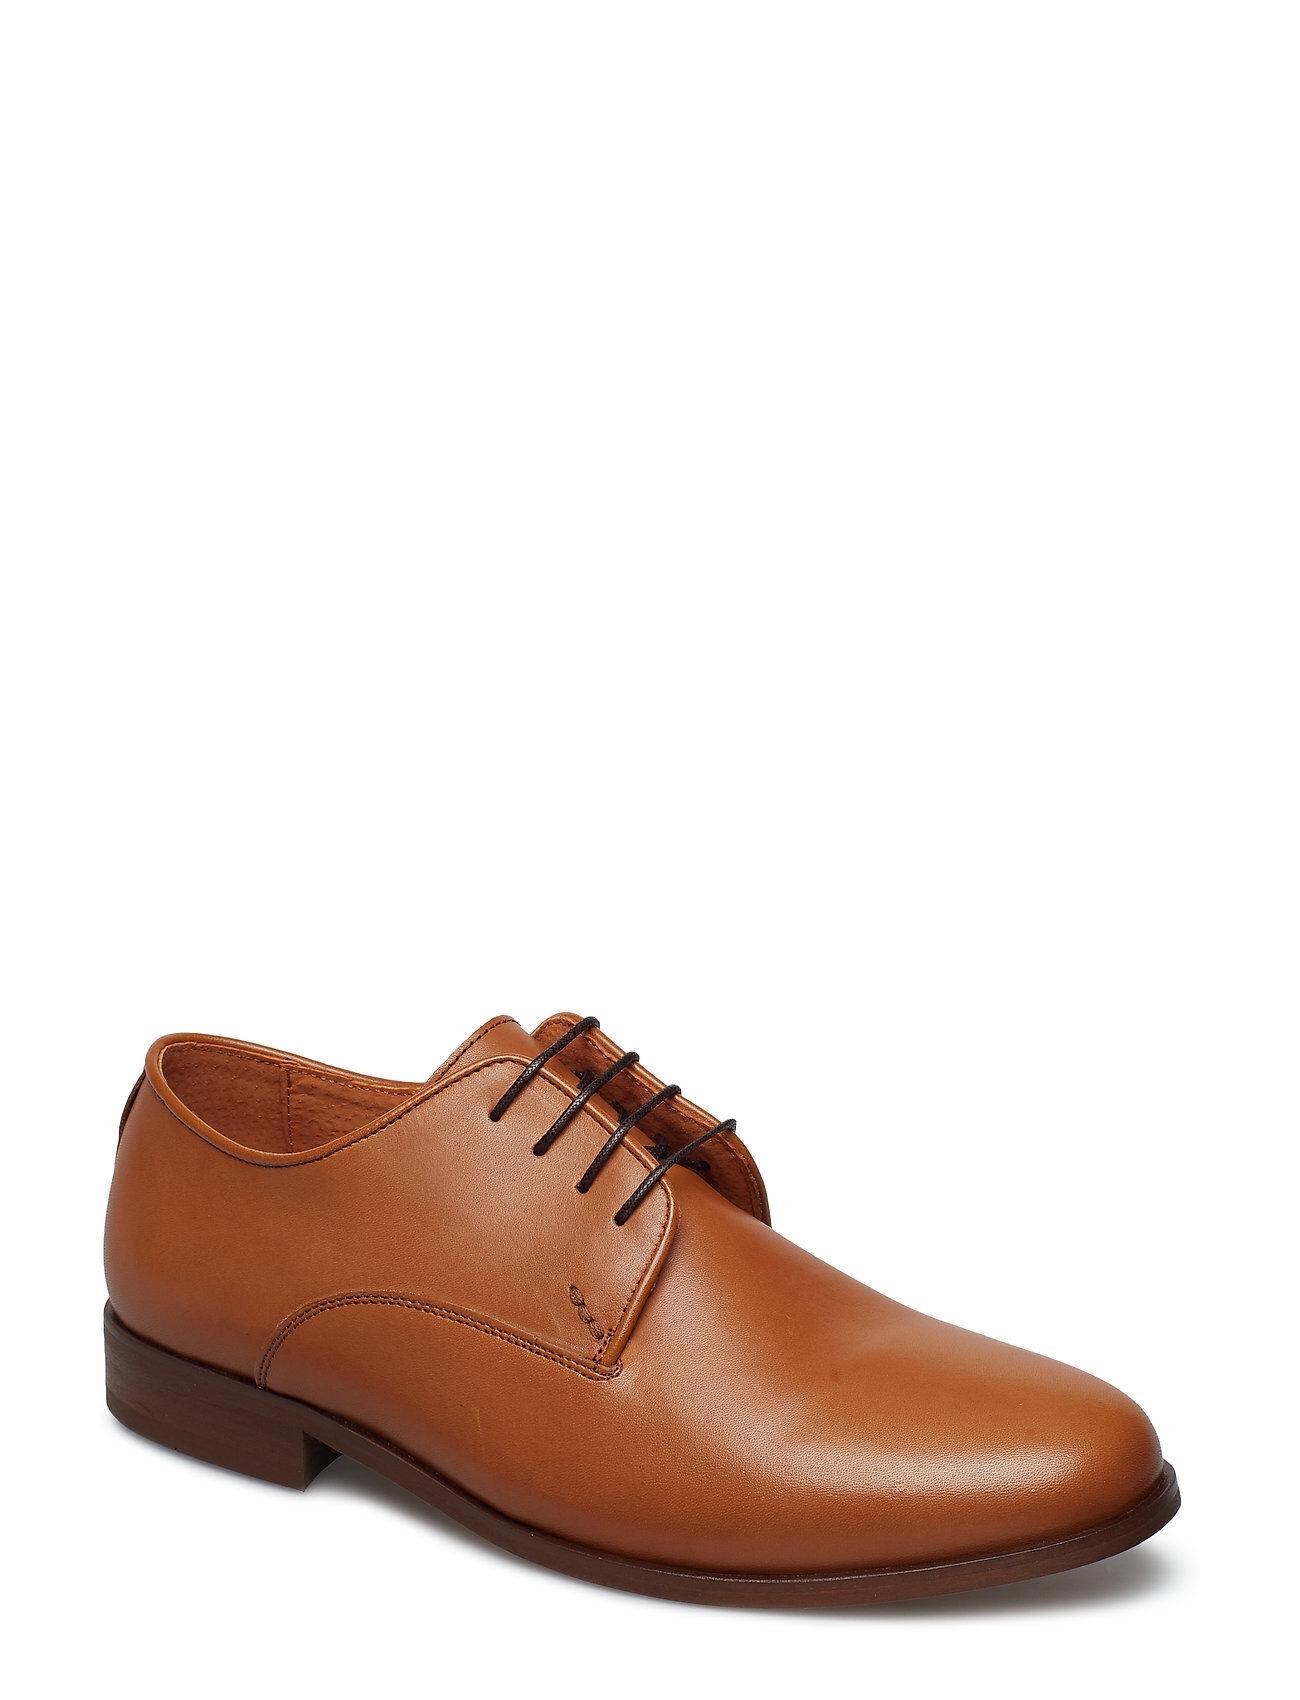 Shoe The Bear Gaston L